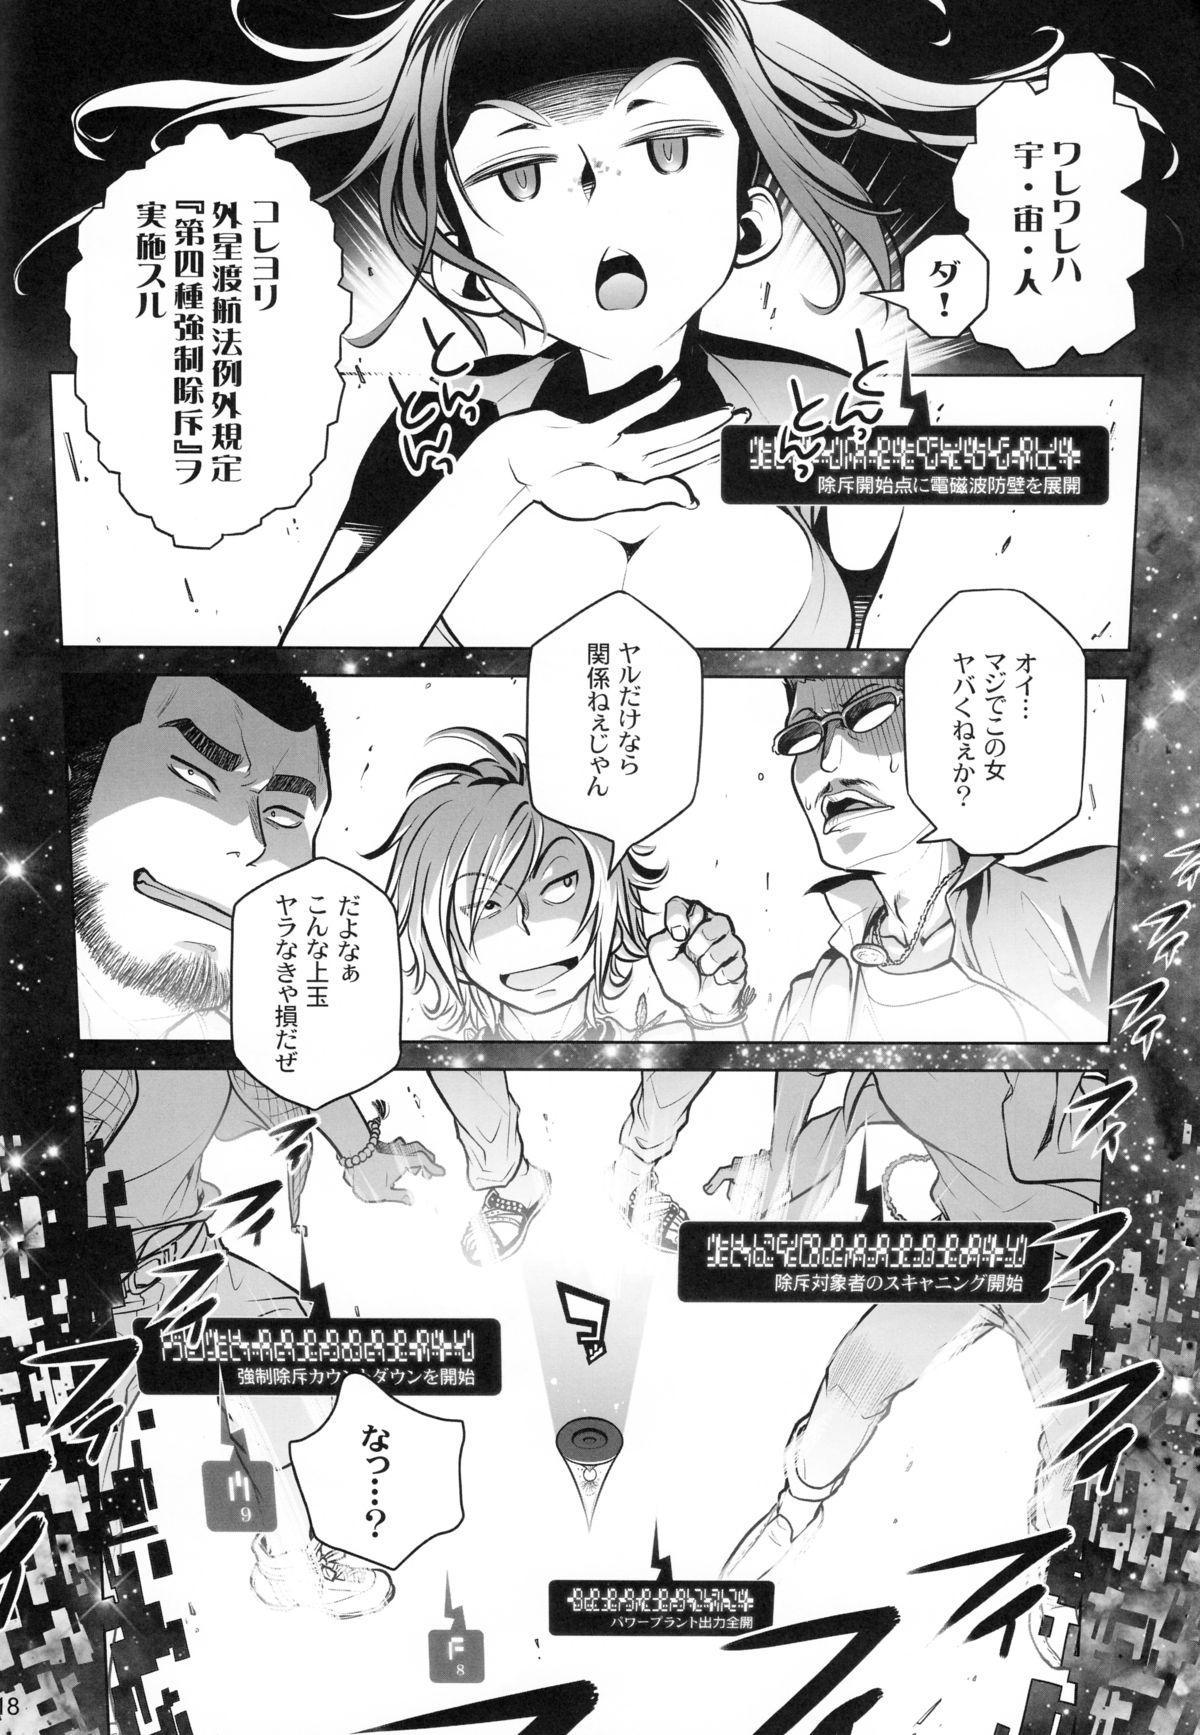 Sorako no Tabi 6 16